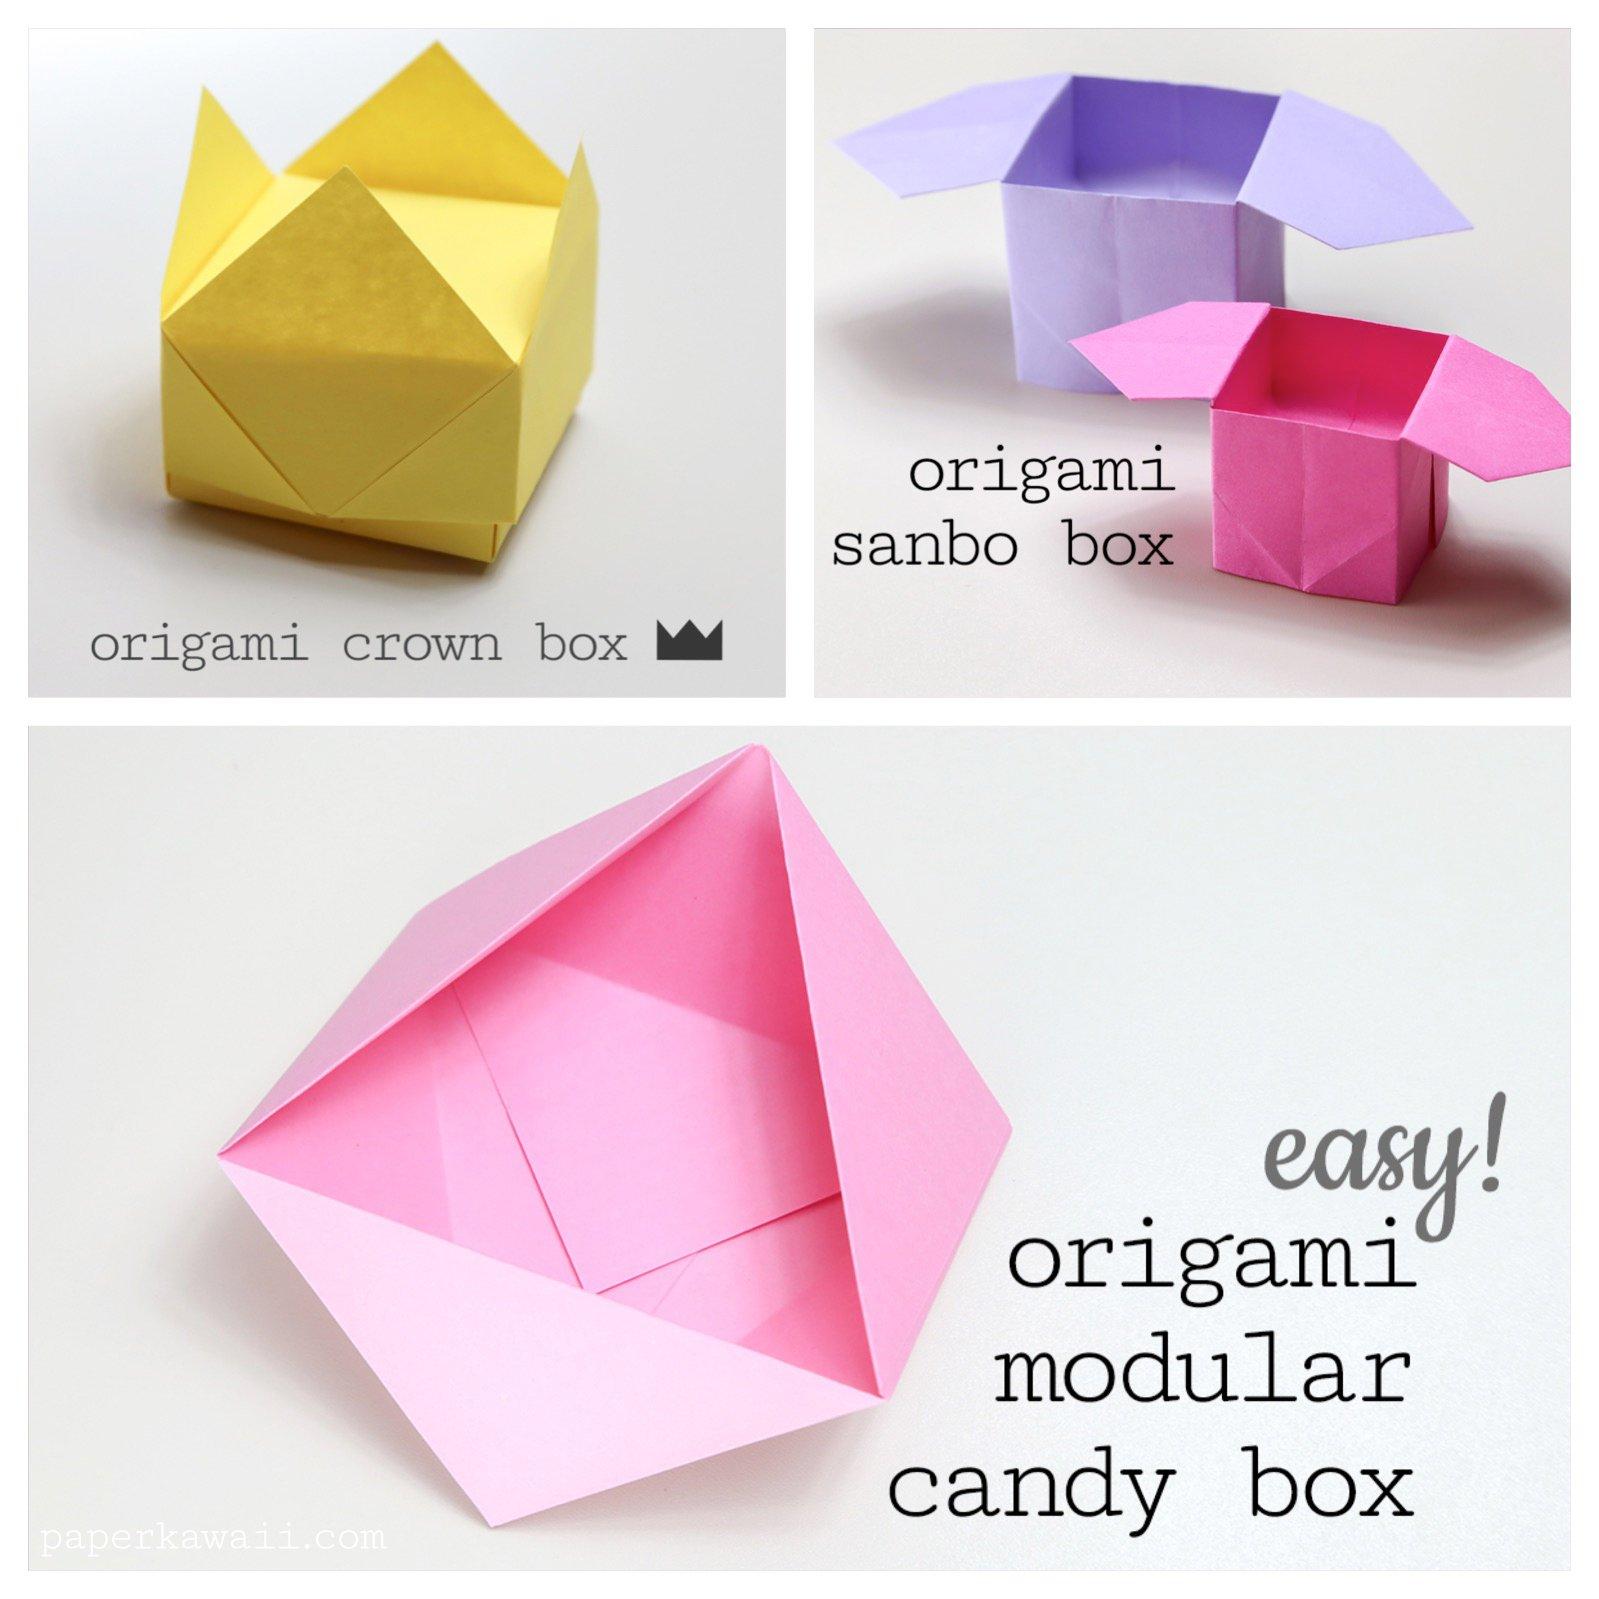 origami box - DriverLayer Search Engine - photo#4